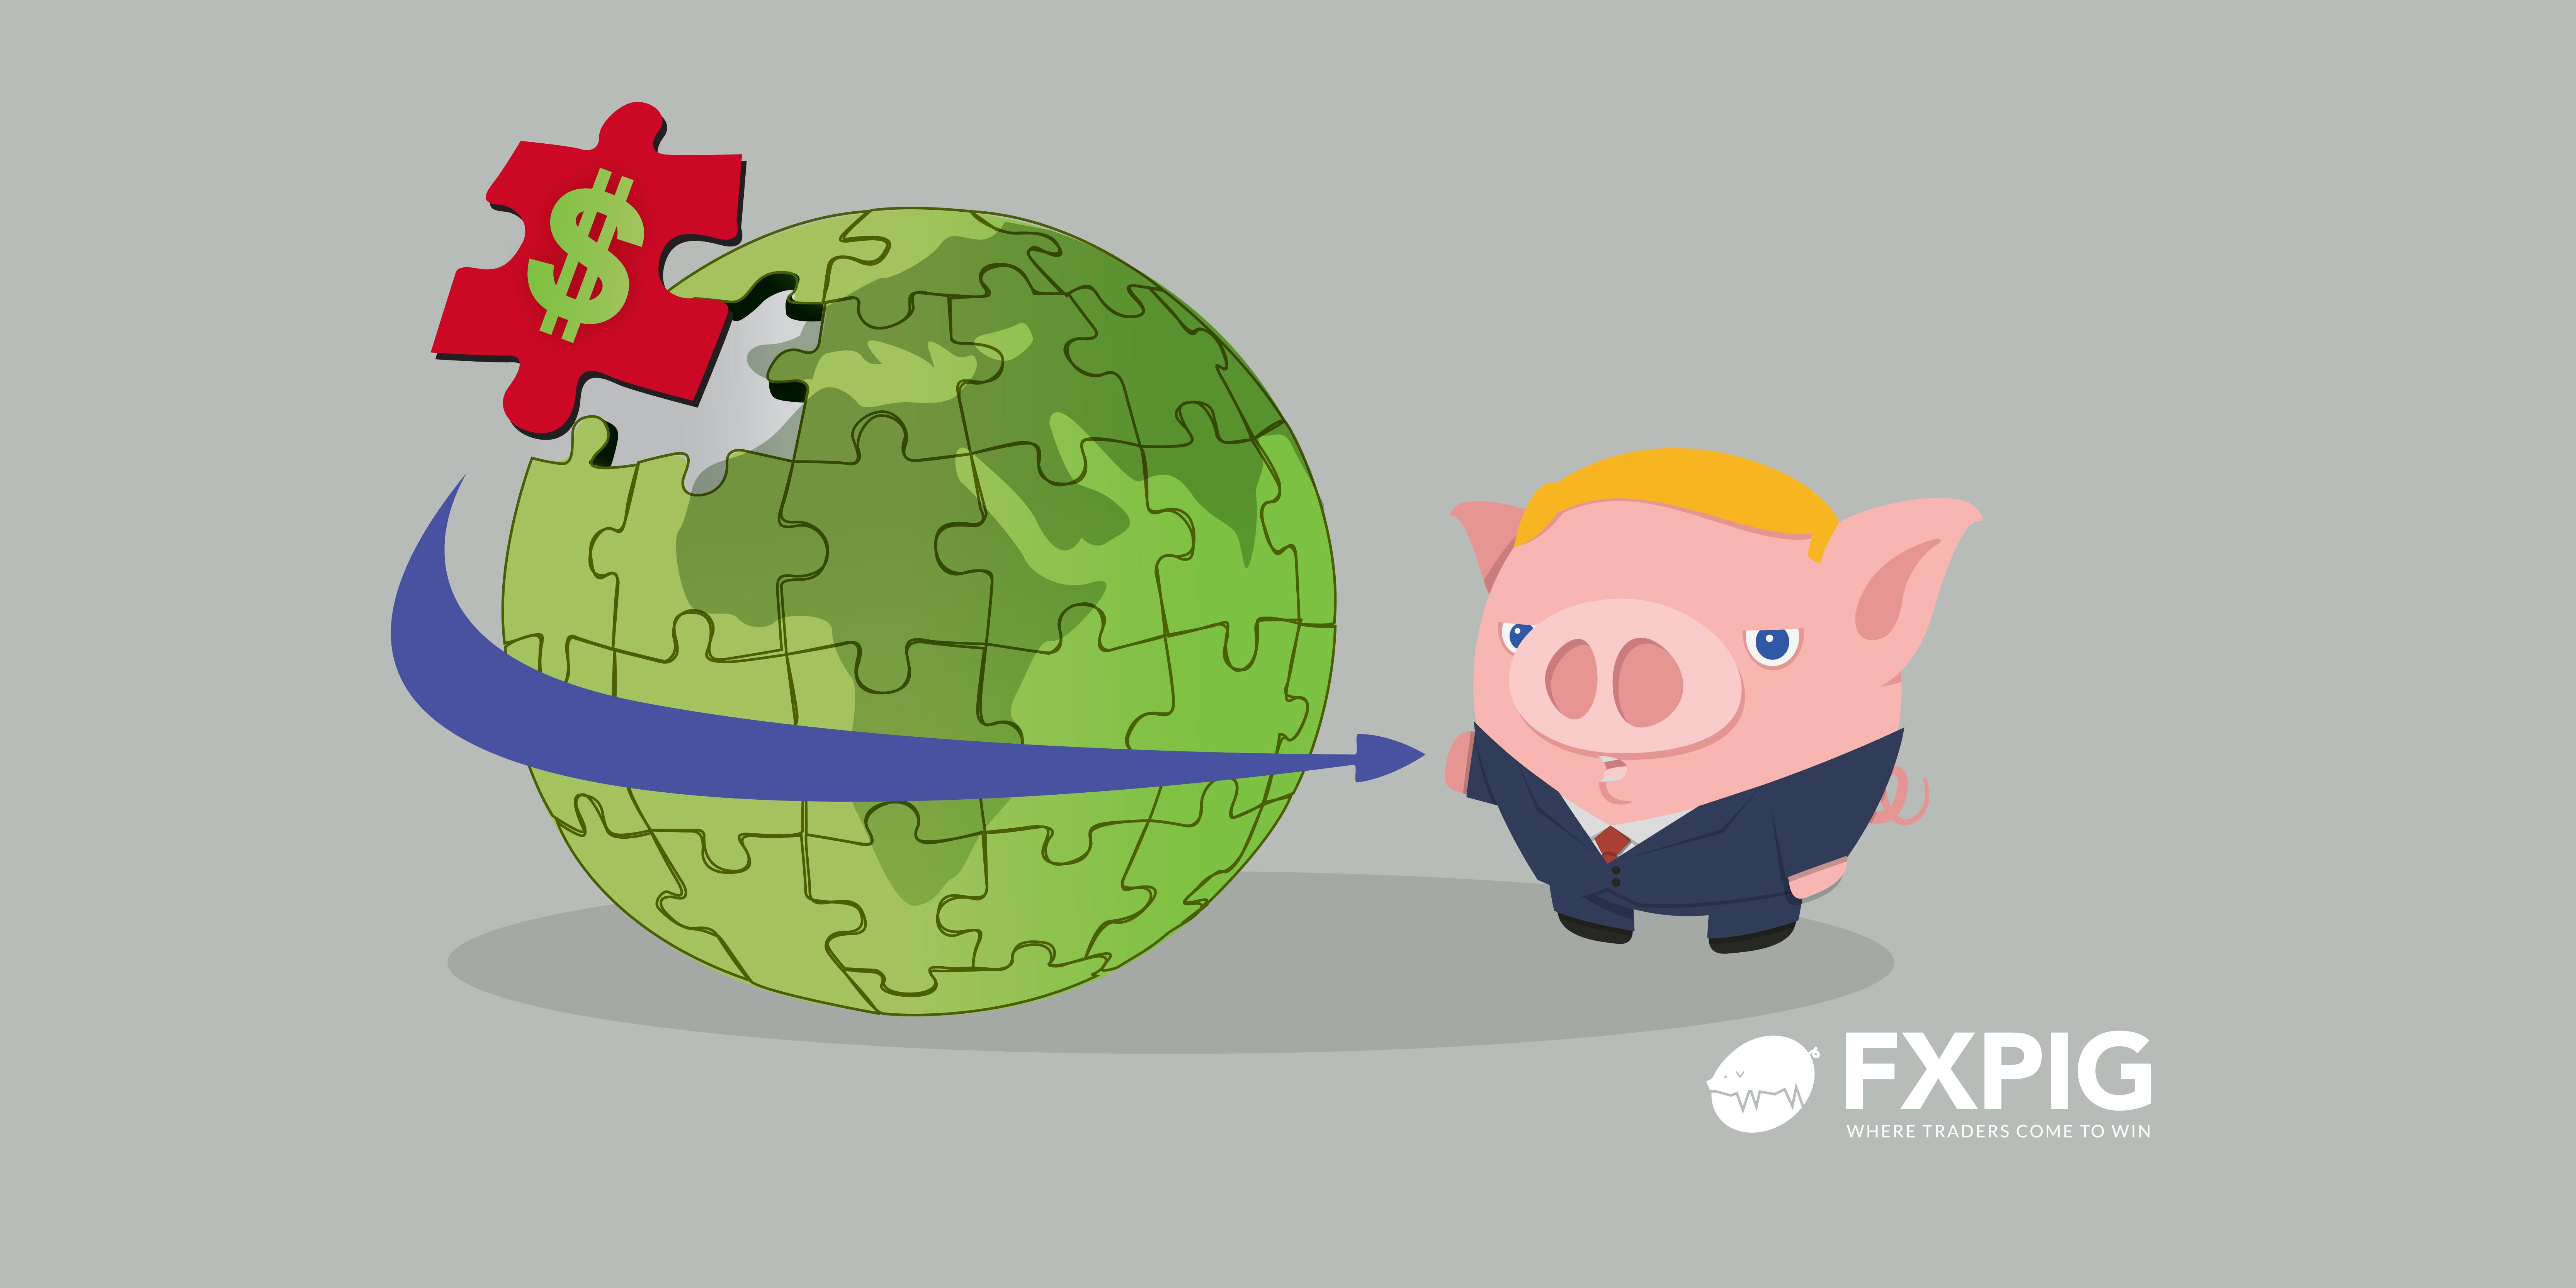 Dollar_Forex_week_ahead_FXPIG